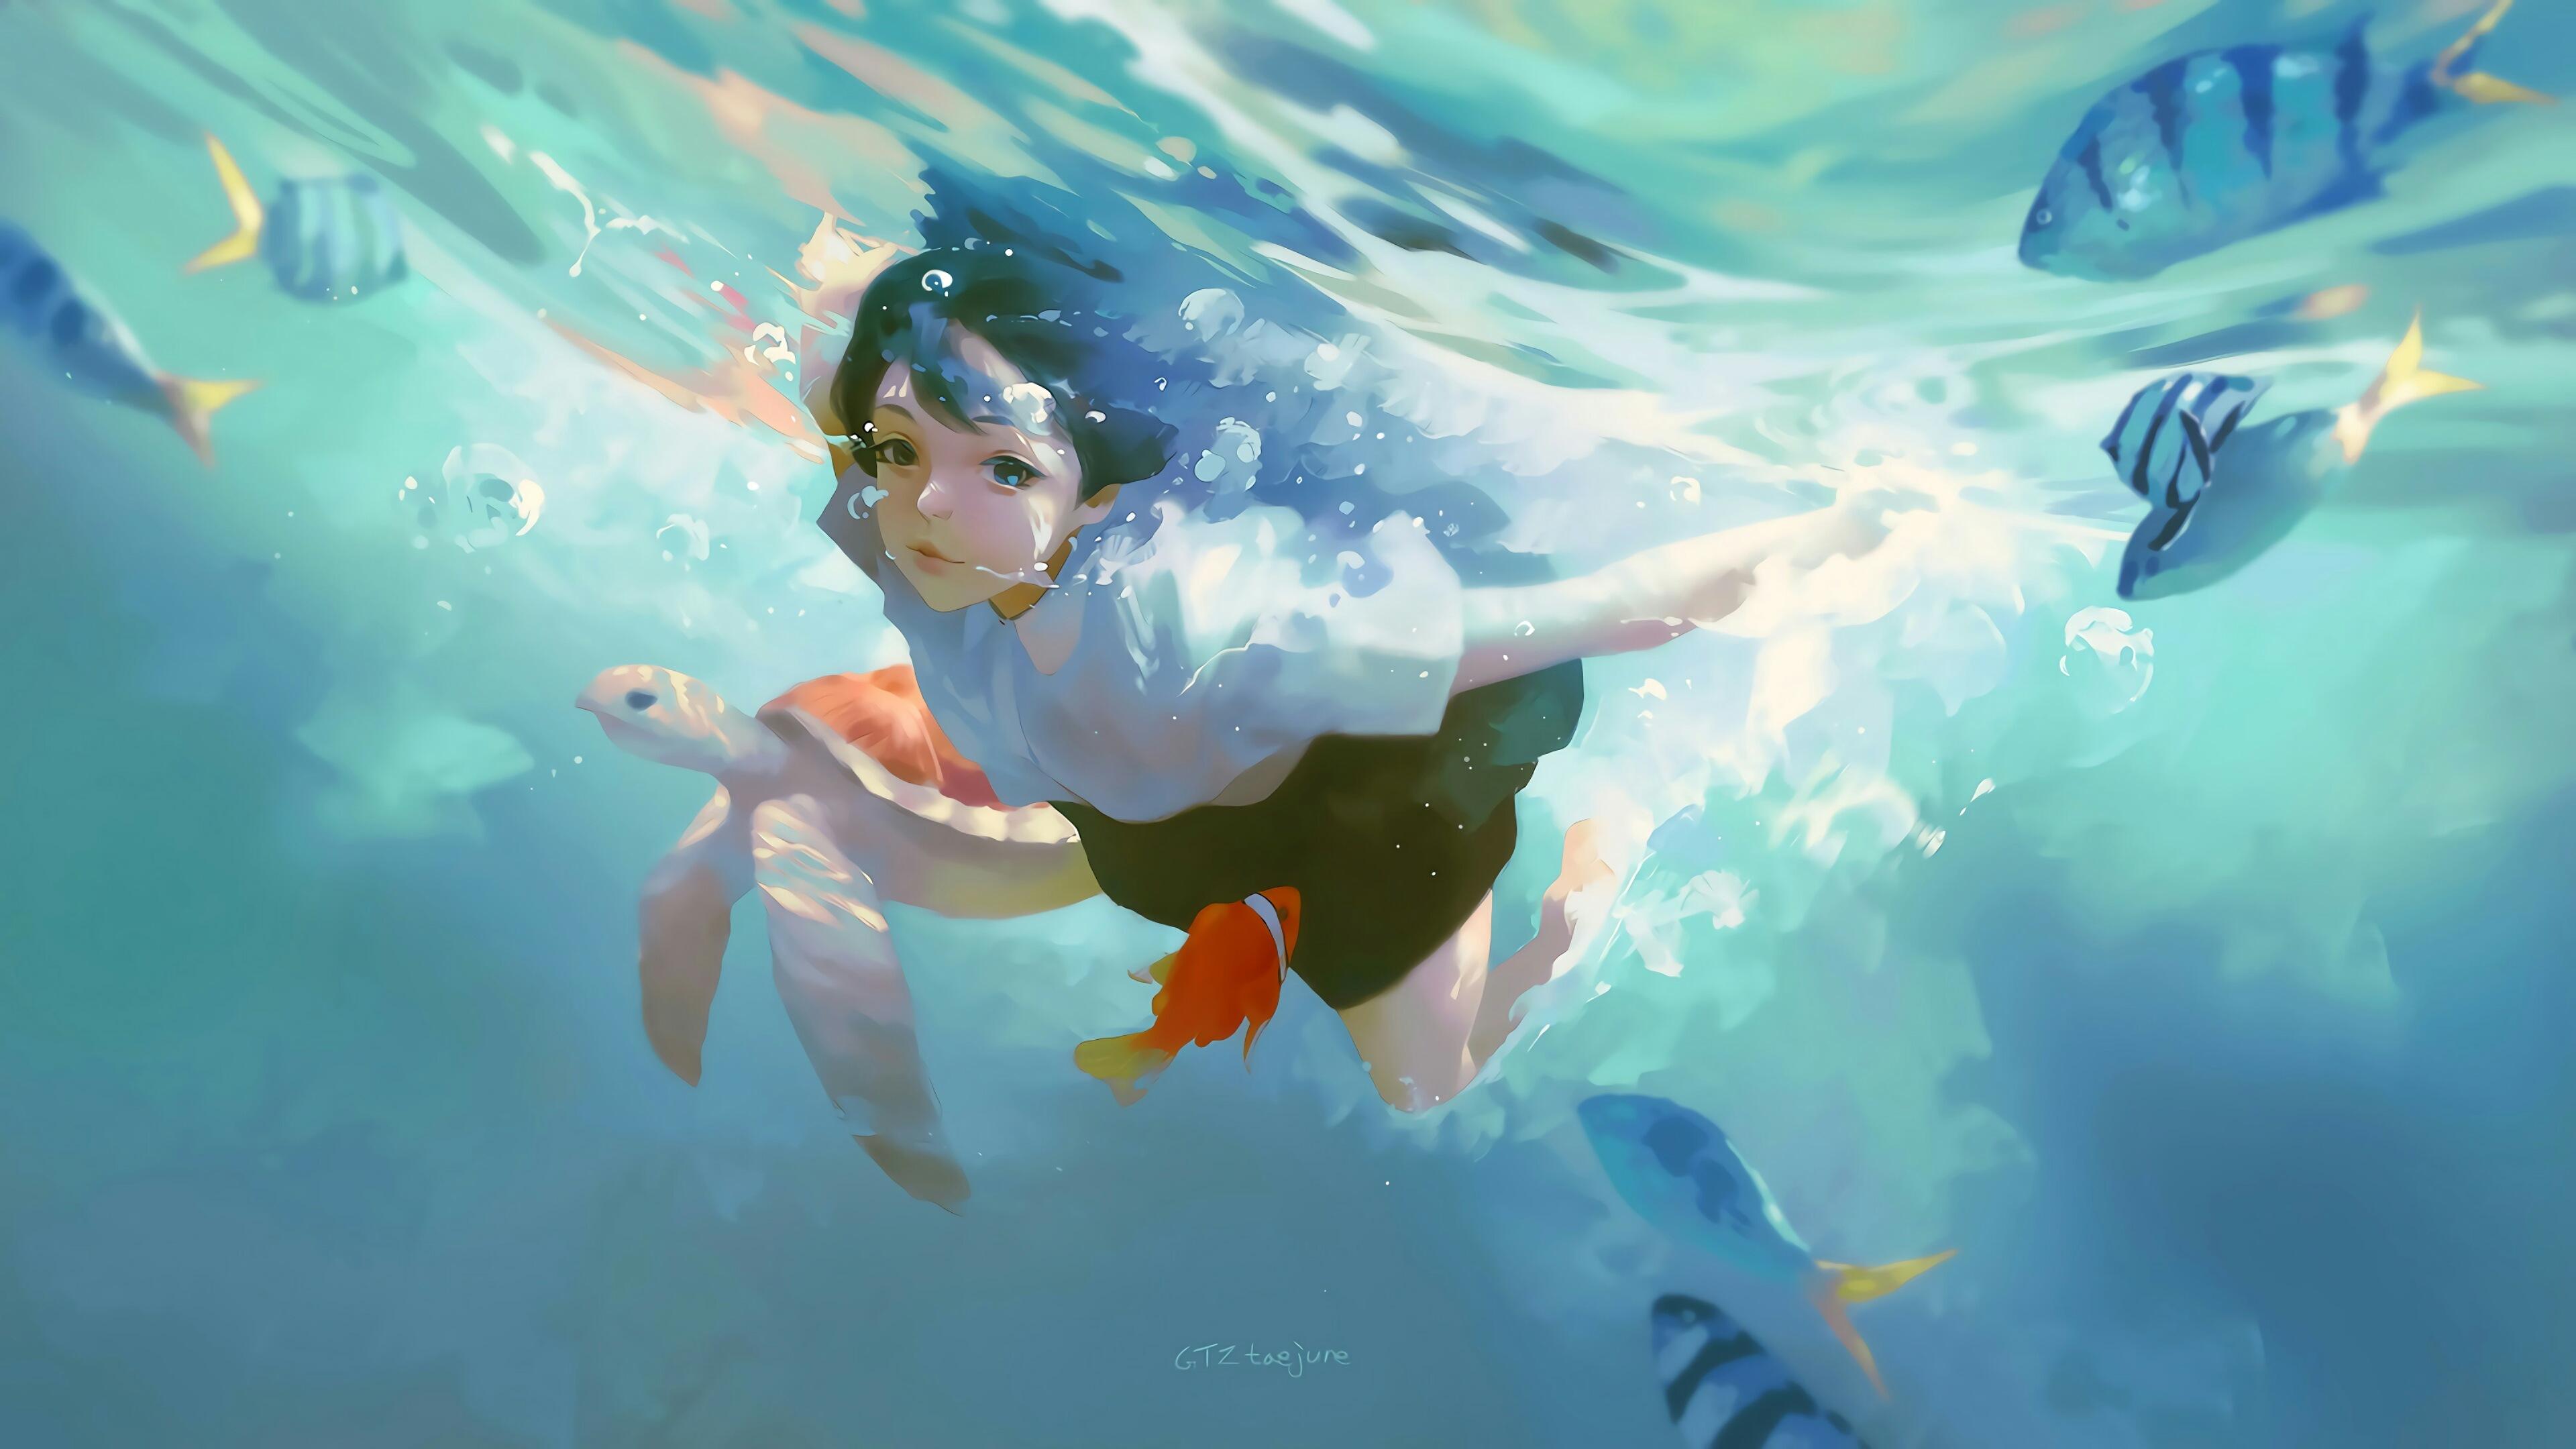 Anime 3840x2160 digital art artwork women brunette Taejune Kim swimming turtle sea fish illustration original characters anime girls drawing water looking at viewer anime in water